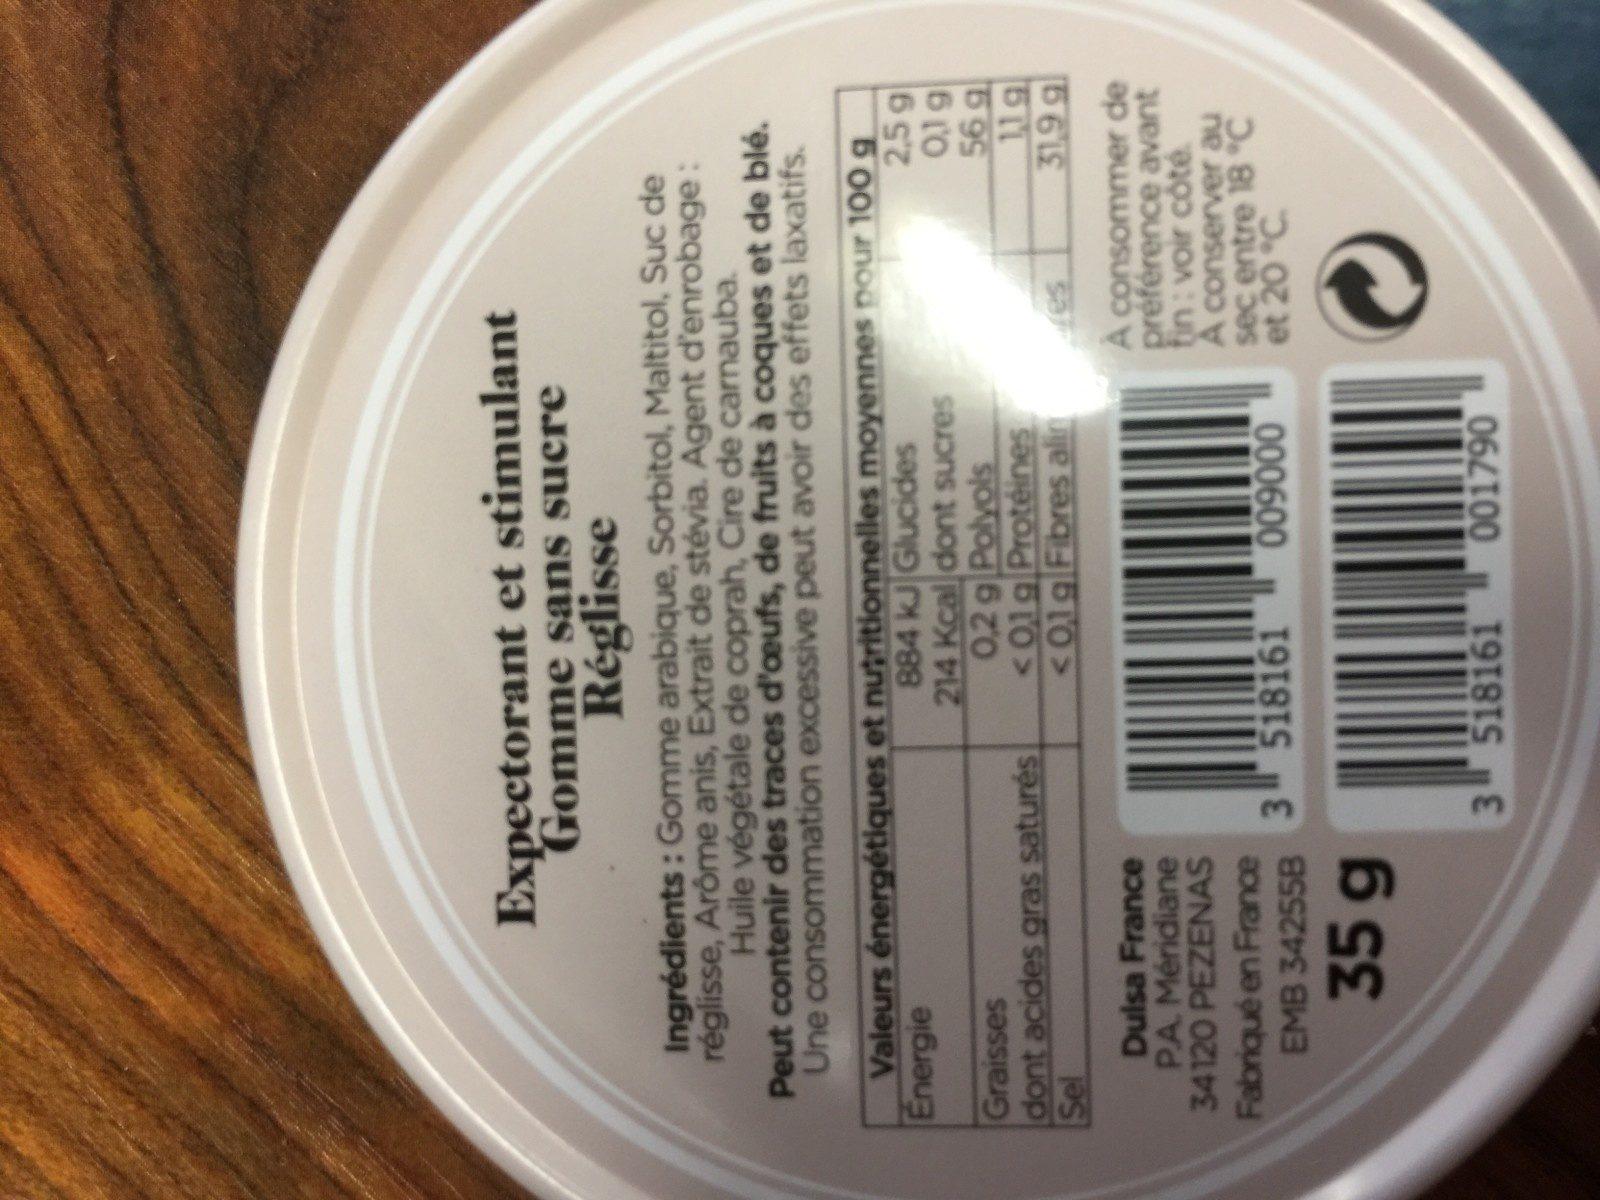 Bienfaisant reglisse - Ingrediënten